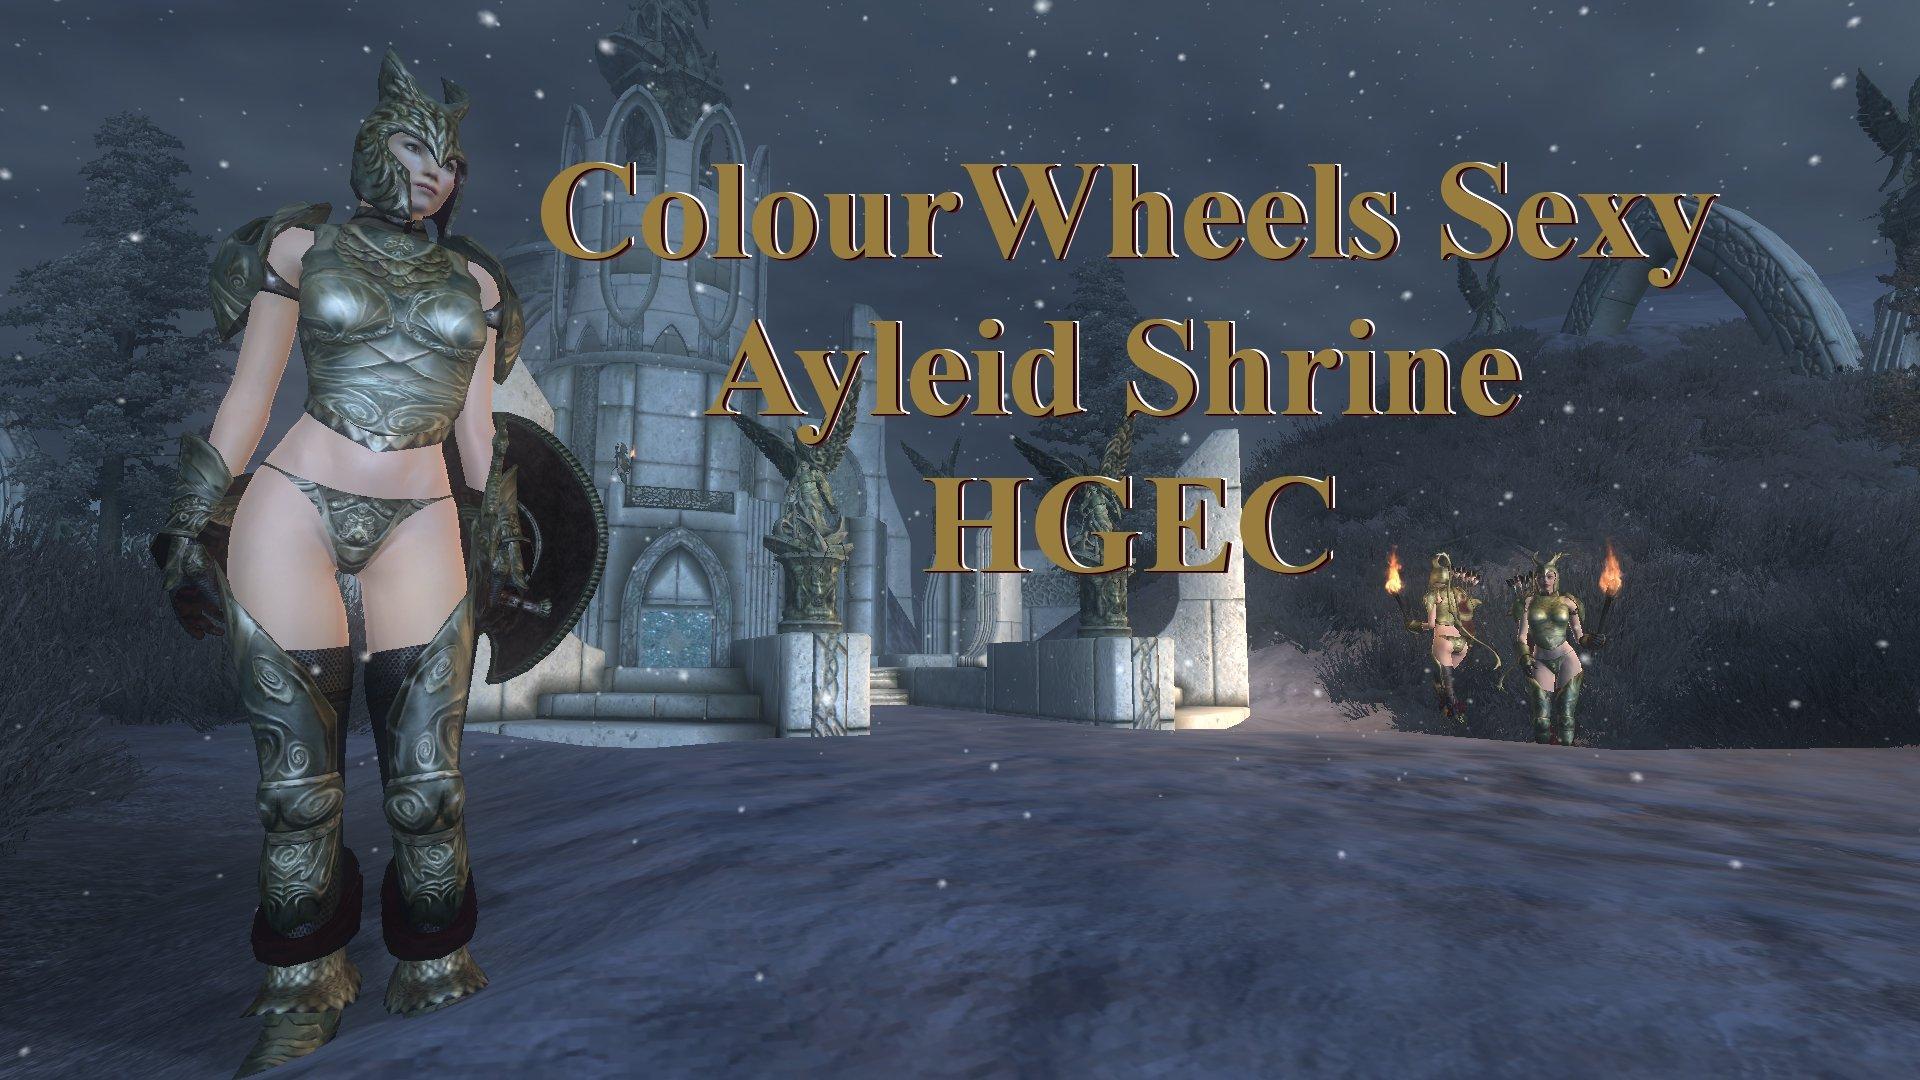 Colourwheels Sexy Ayleid Shrine HGEC Rus